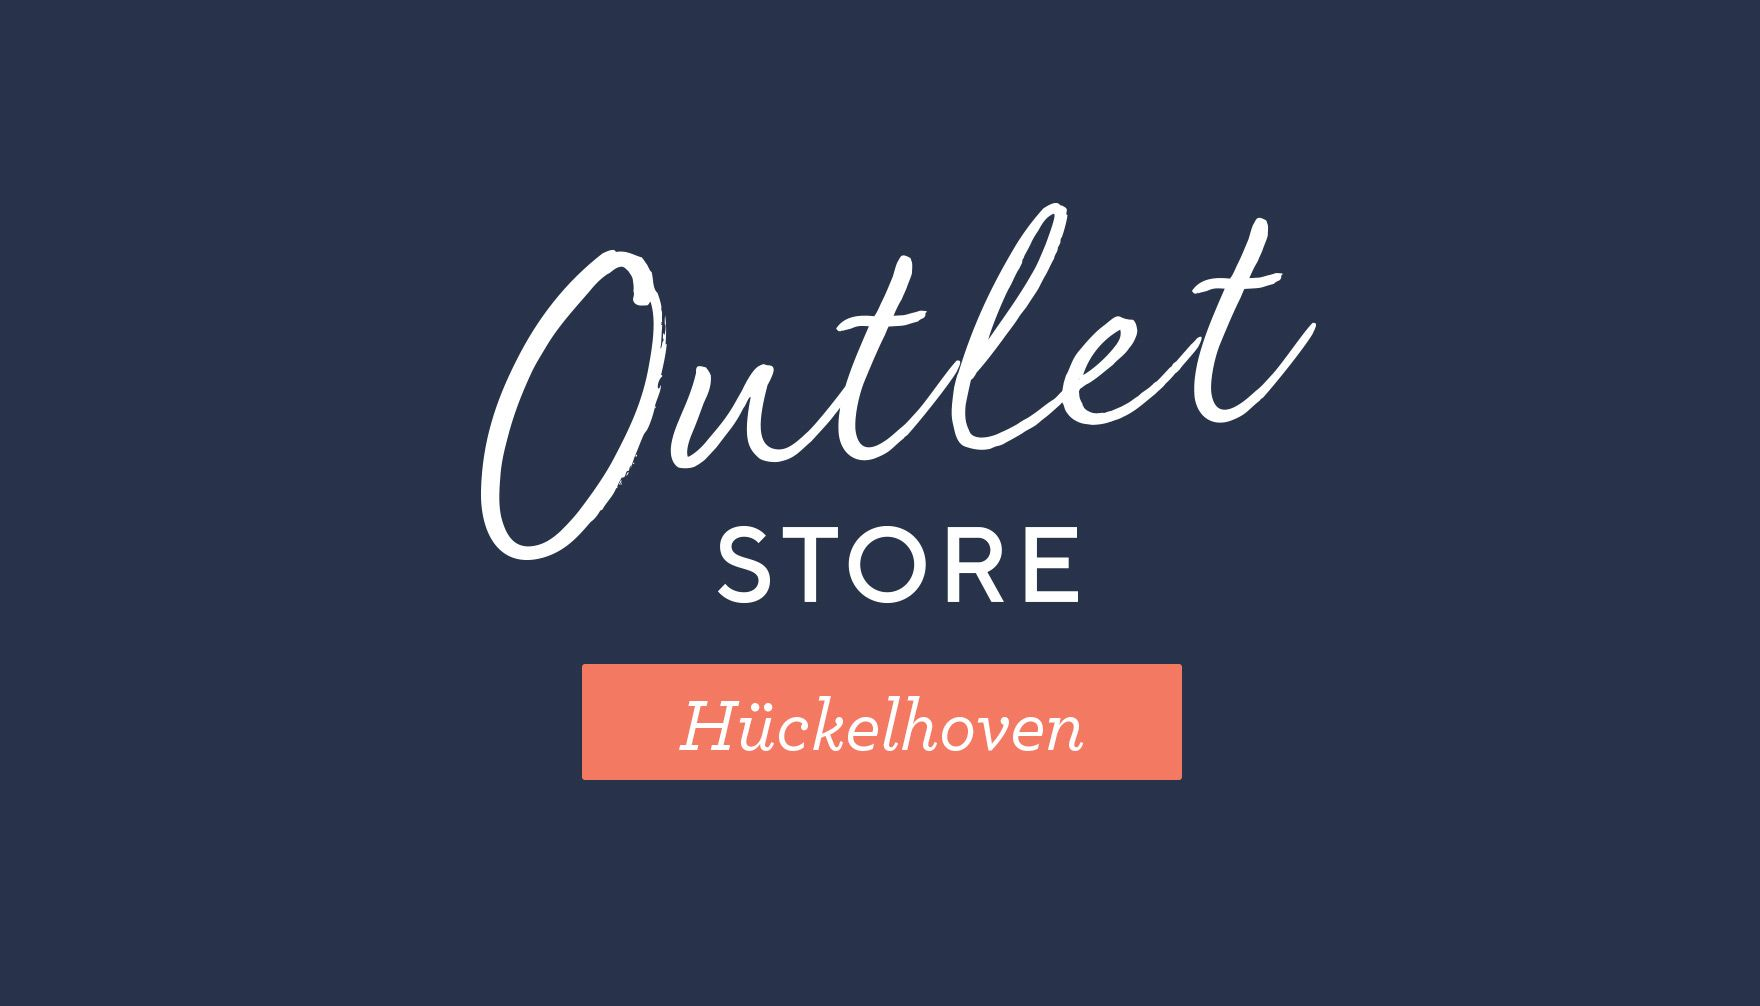 Q Outlet Store Hückelhoven